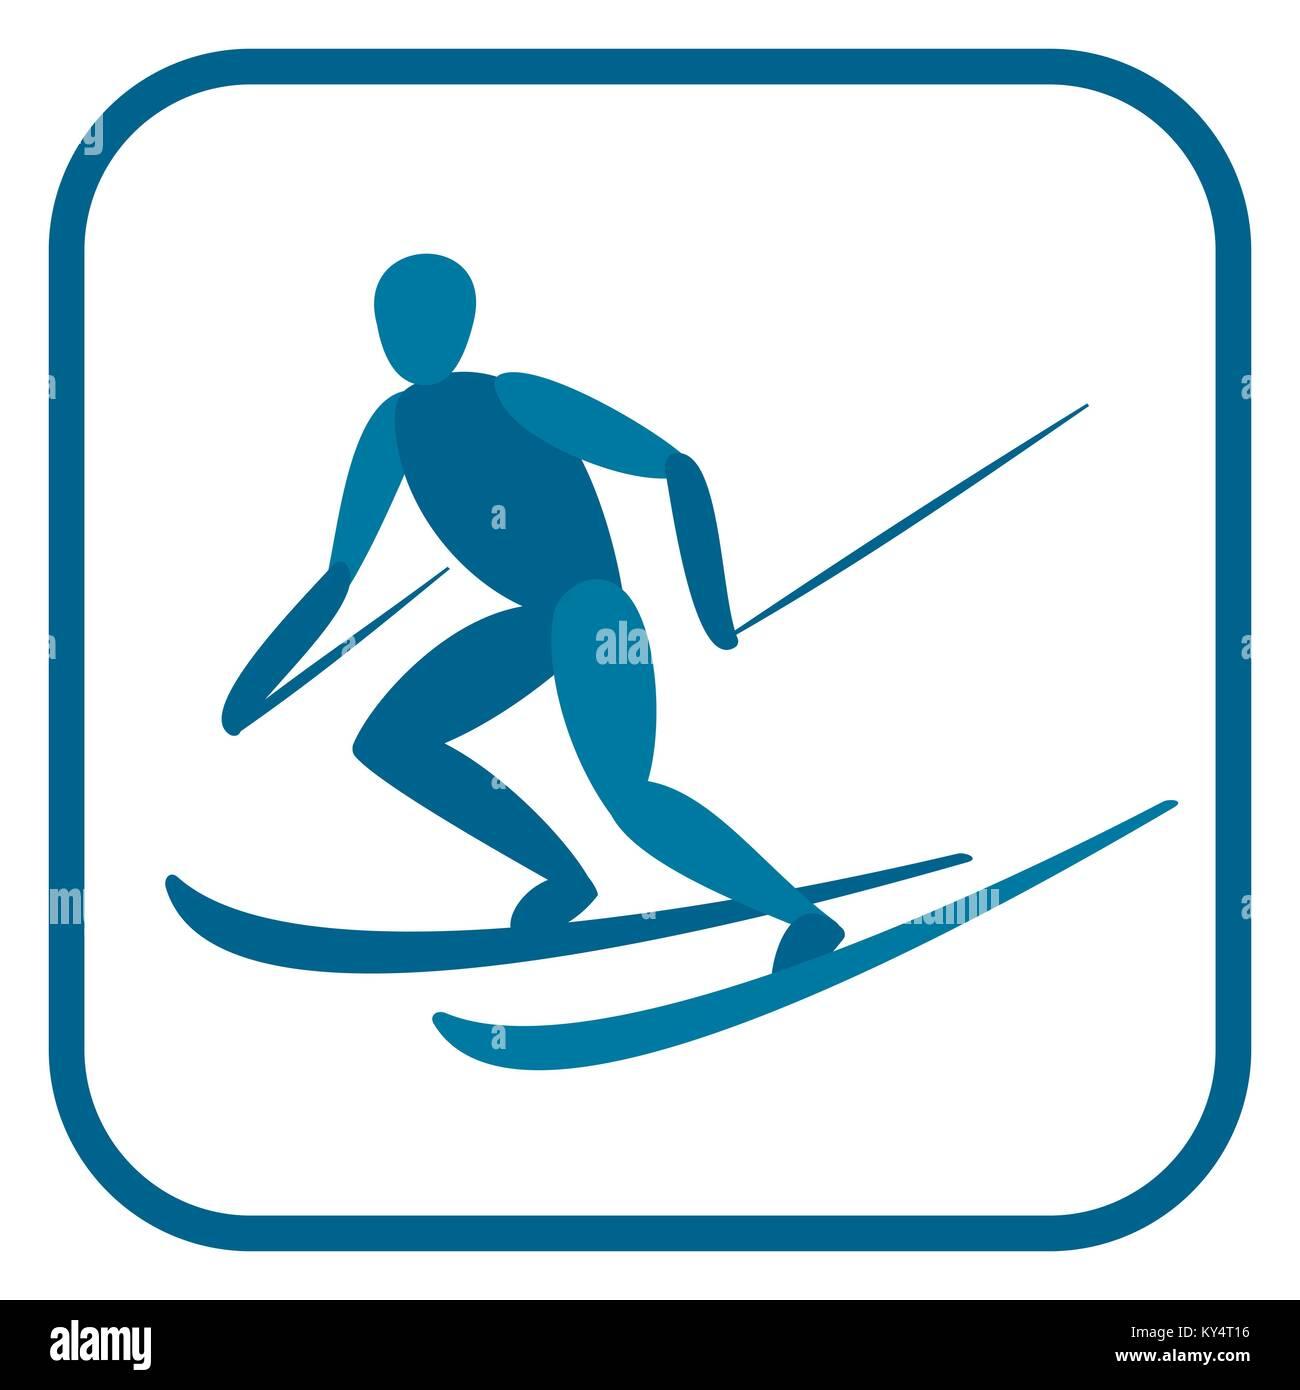 Alpine skier emblem. Stock Vector